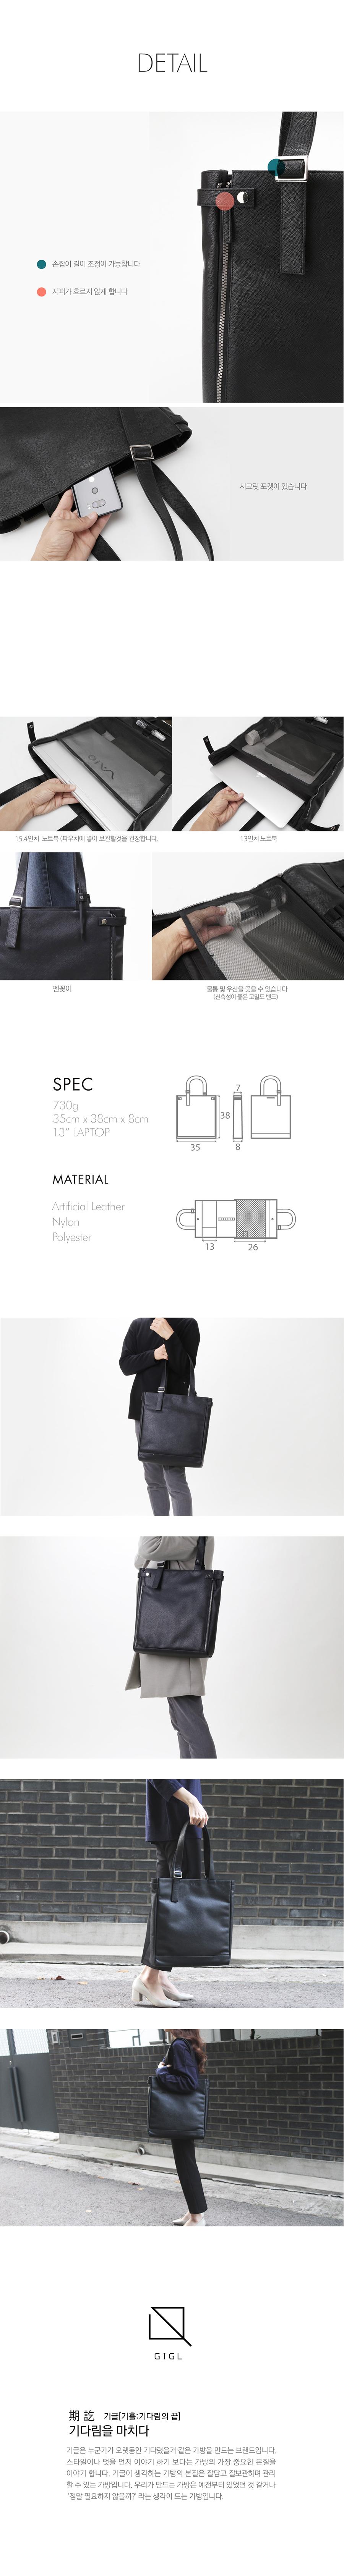 layout_totebag_2018_사피아노-06.jpg